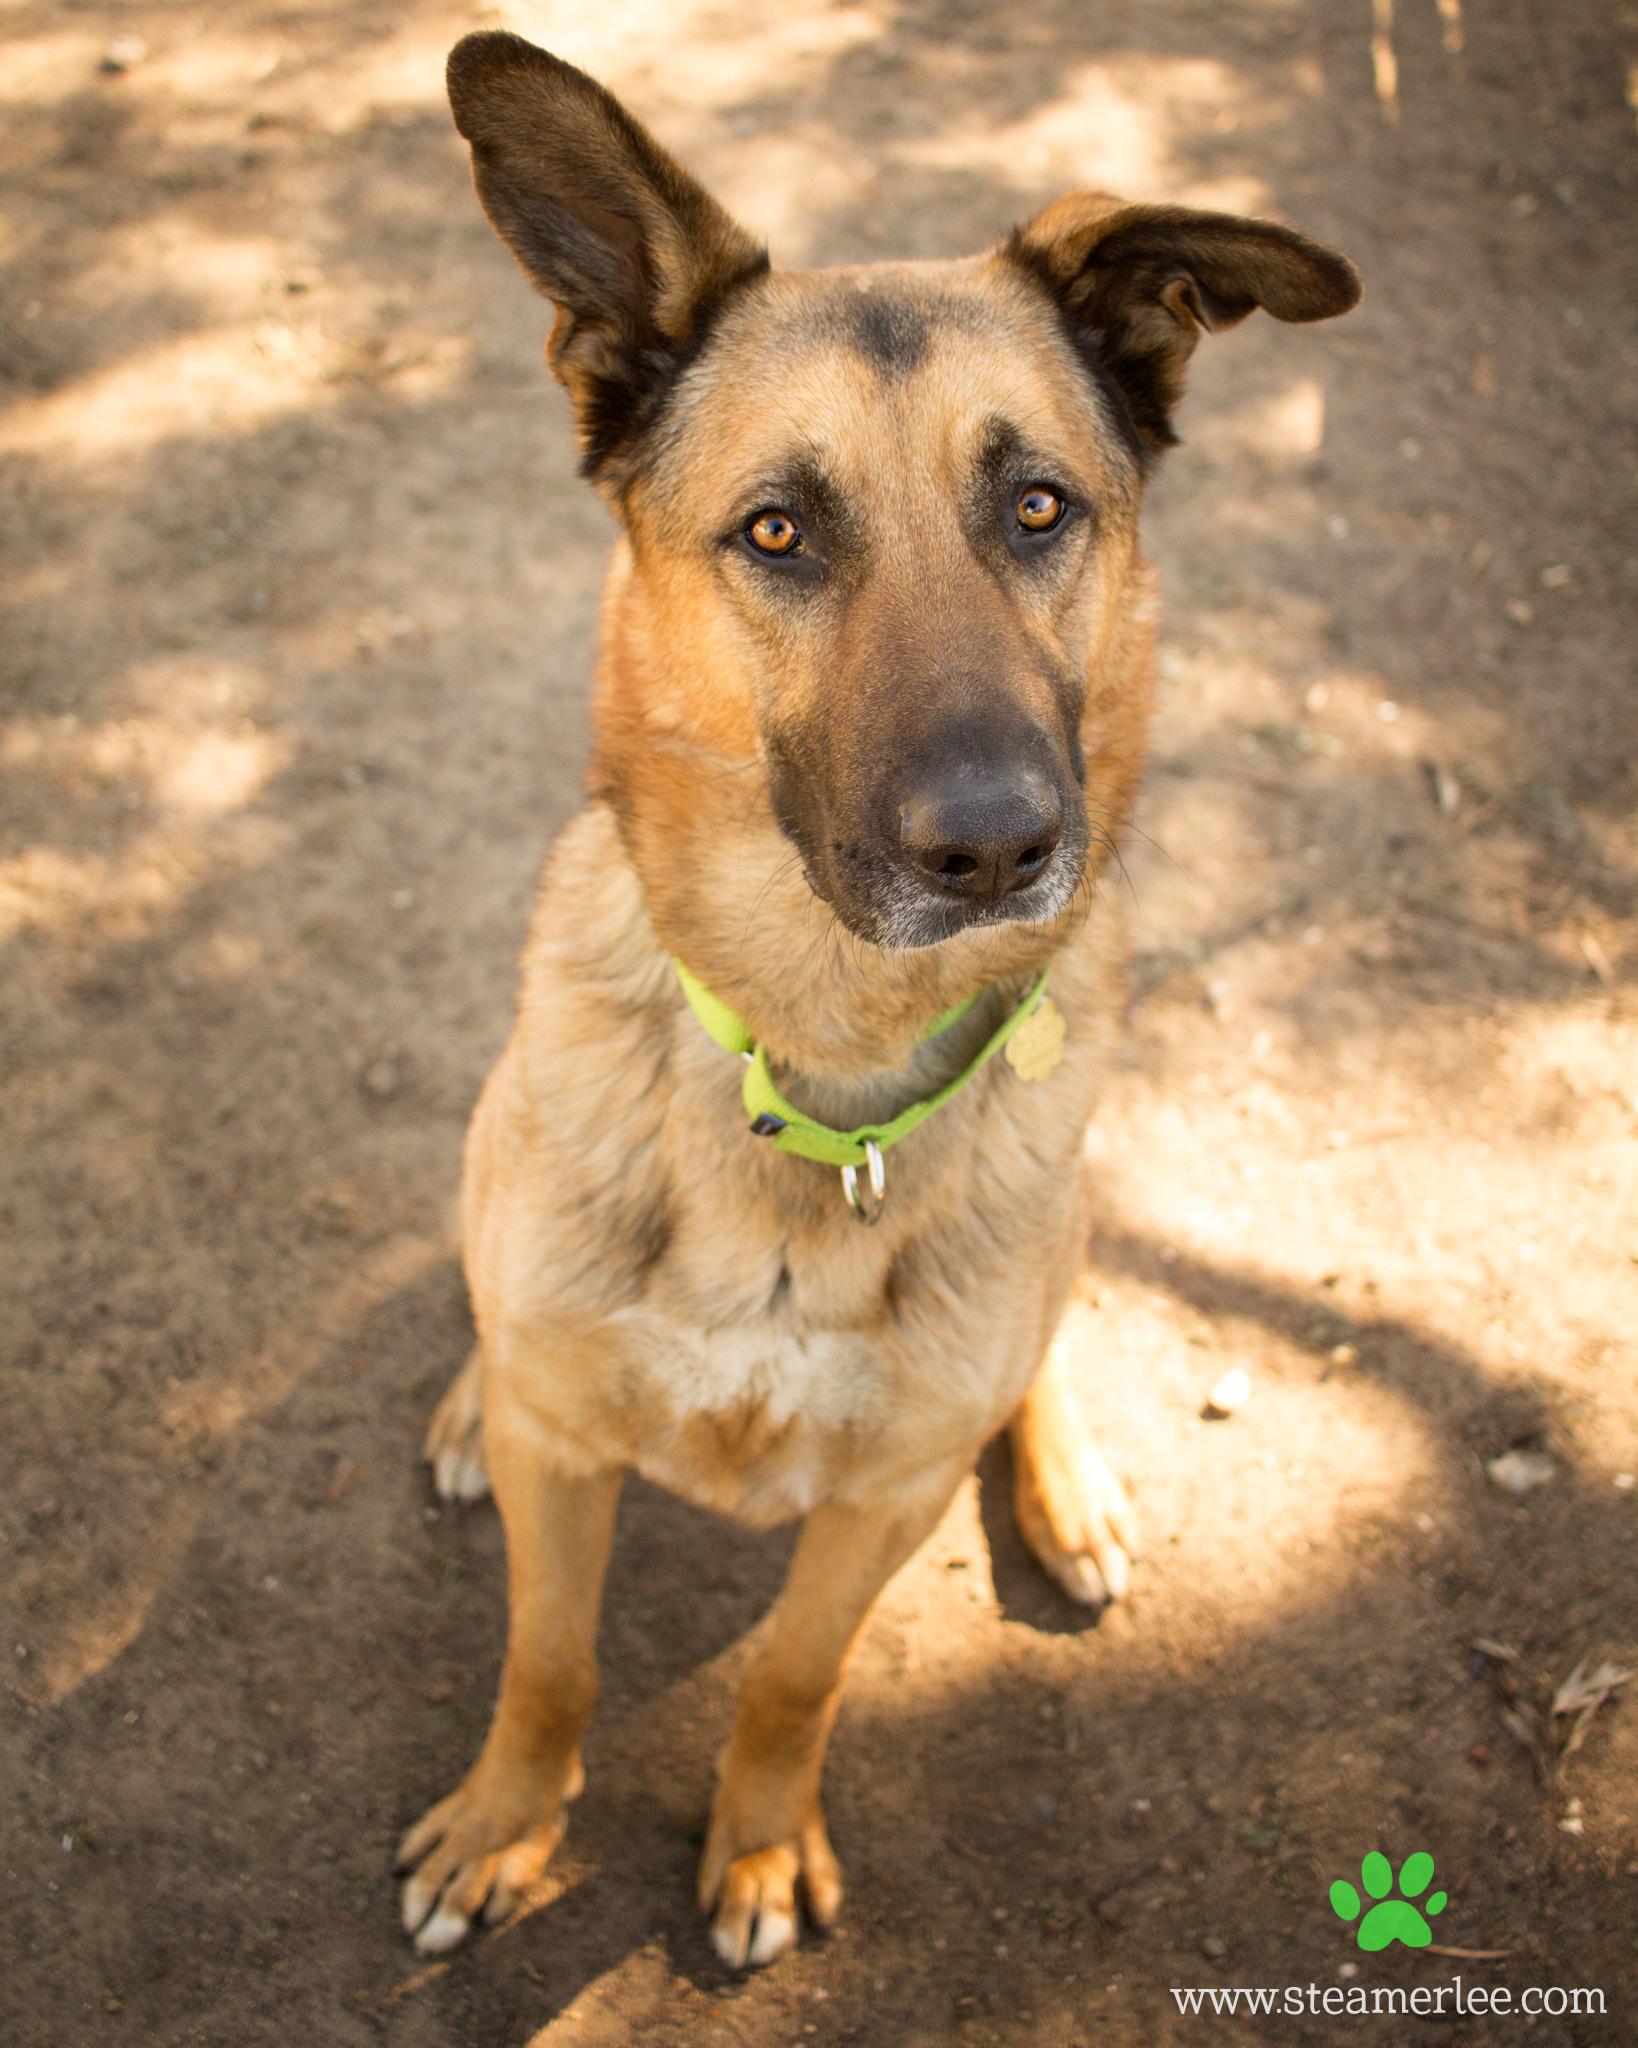 174 Orange County Dog Photography - Steamer Lee - Southern California.JPG